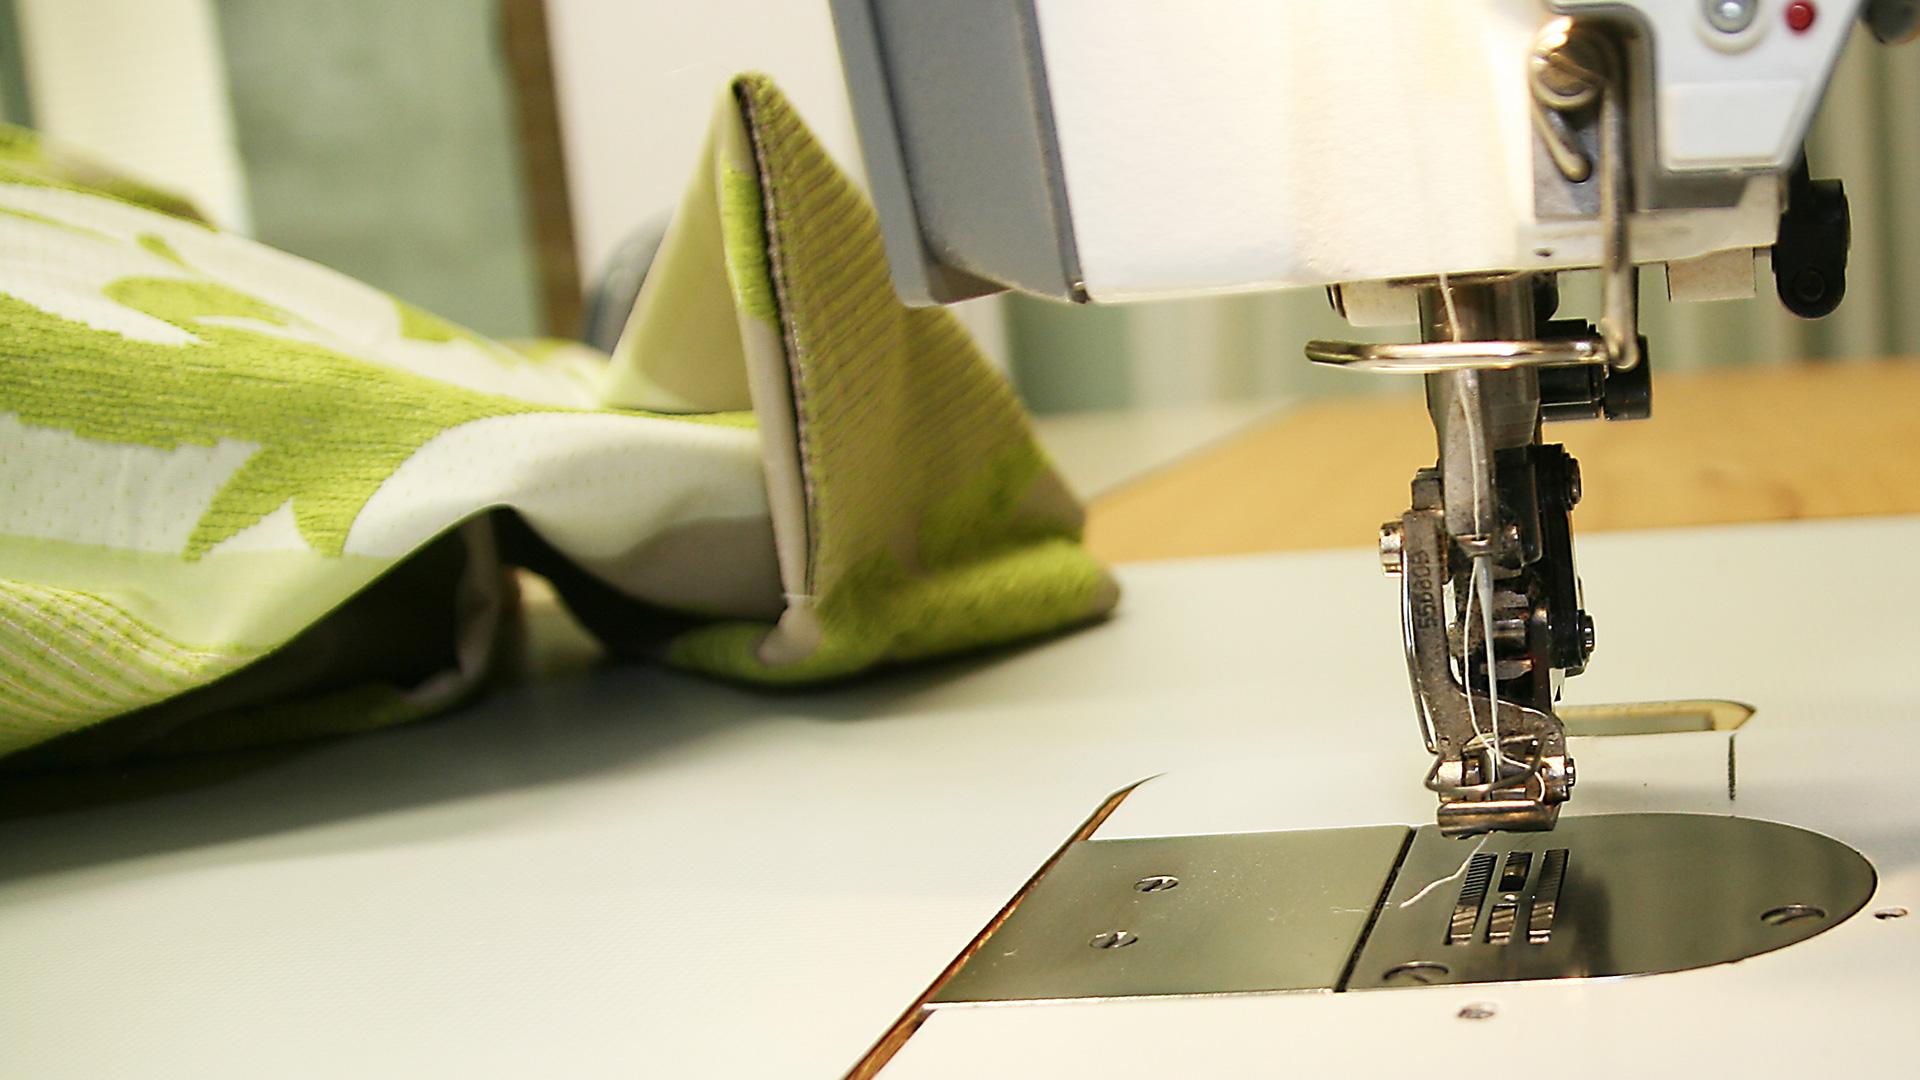 Polsterwerkstatt dekoline modernes wohndesign in pasewalk for Wohndesign 2015